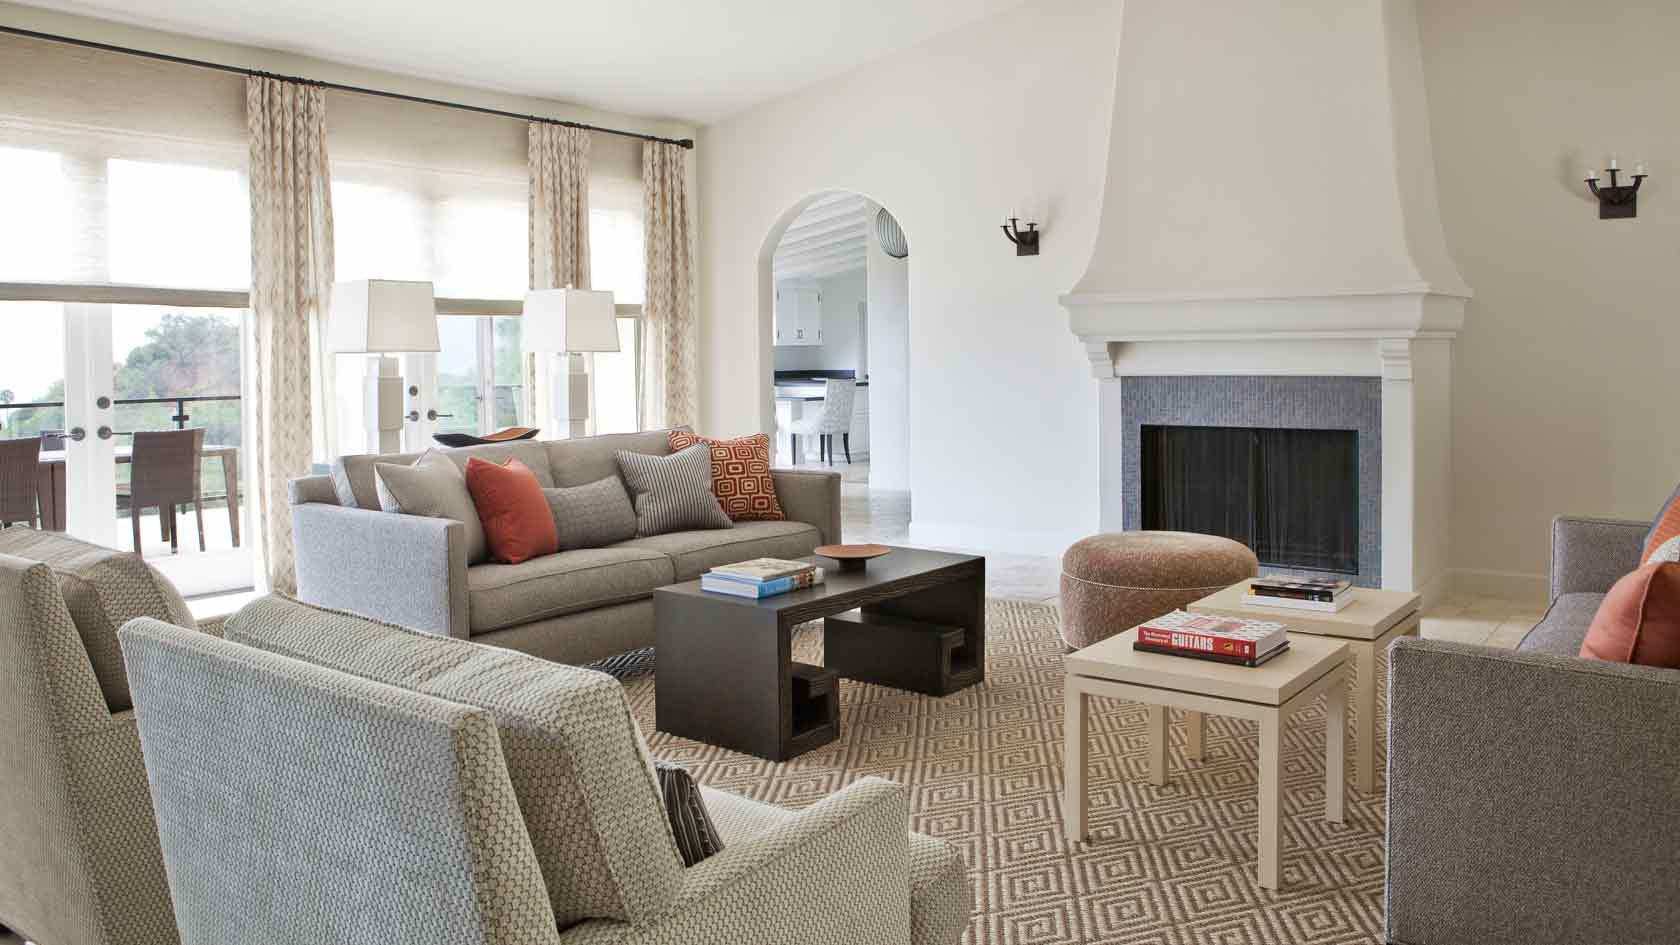 mondrian sofa